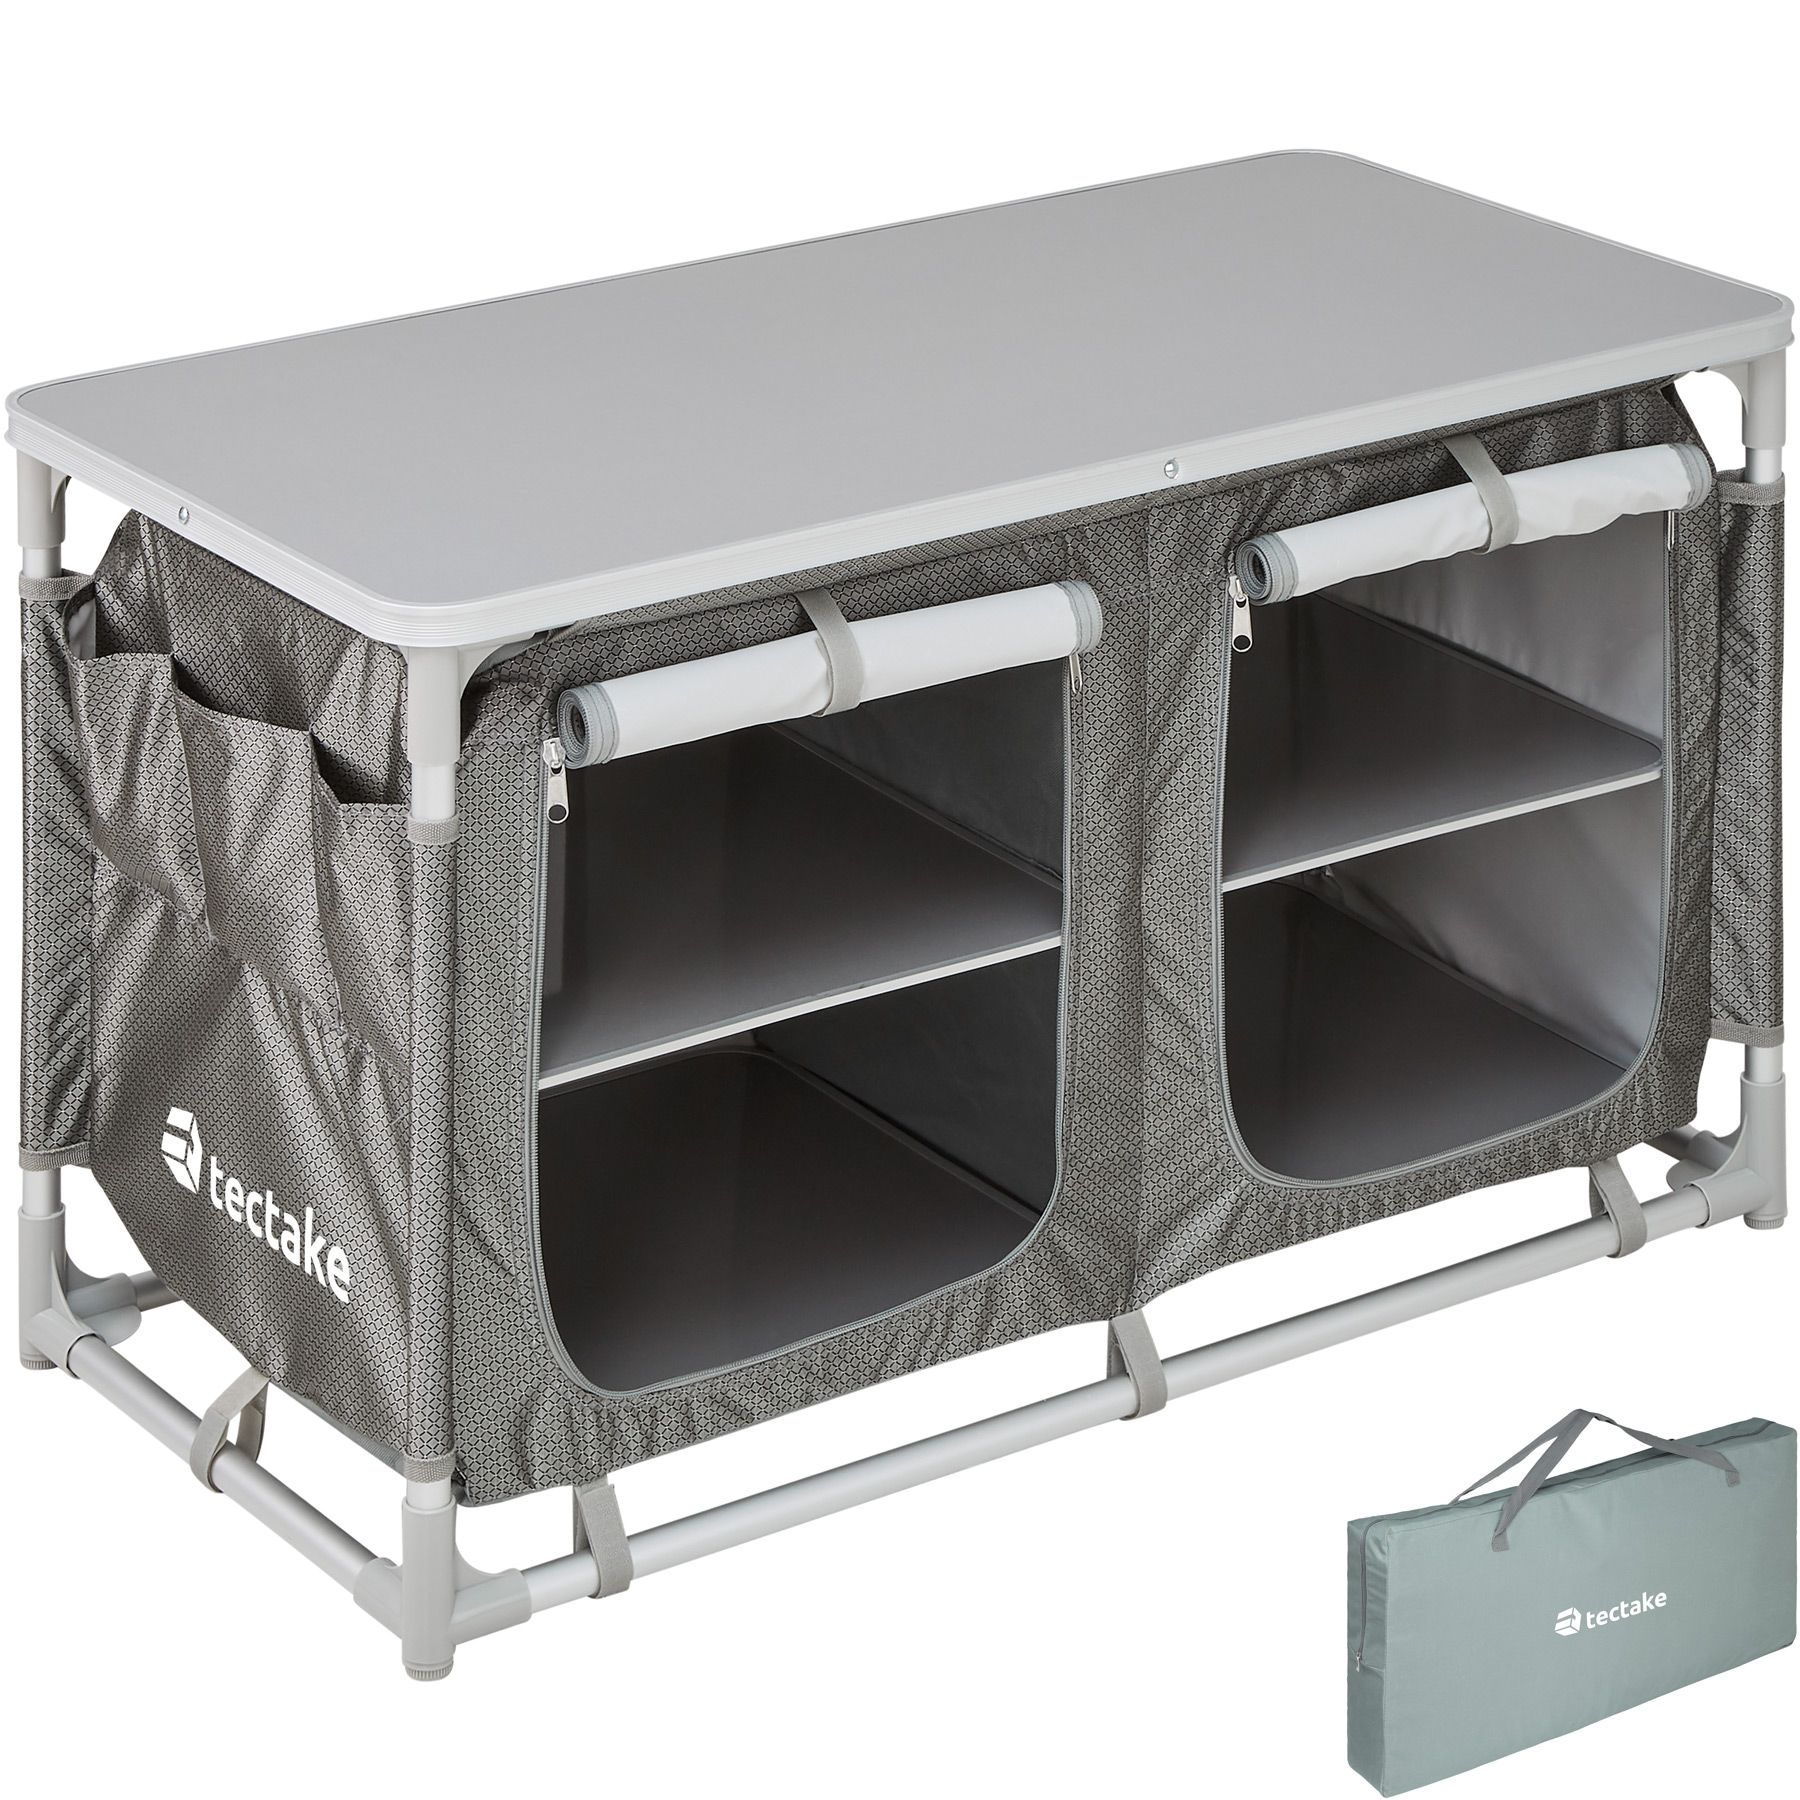 Camping kitchen Camp Cook Camping cupboard 2 compartments Aluminium hob